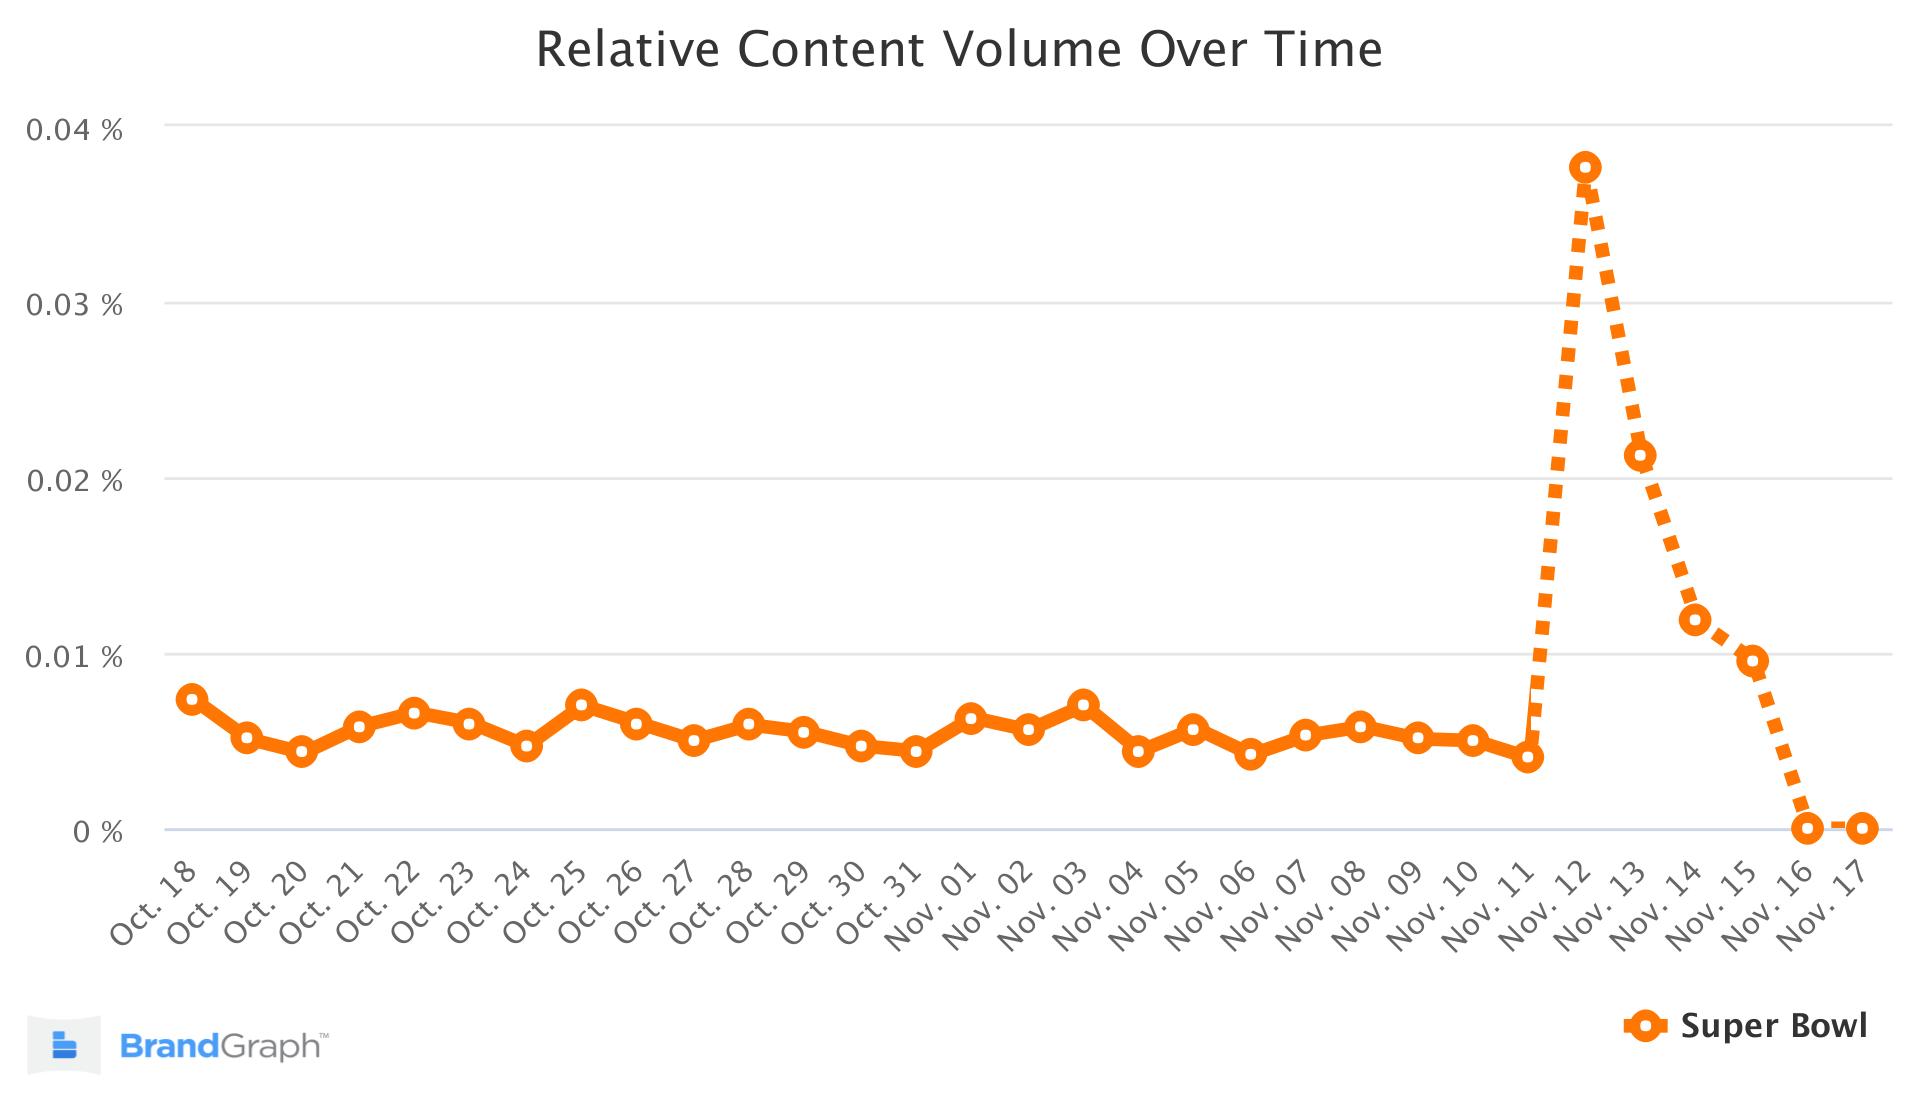 Super Bowl BrandGraph Trend